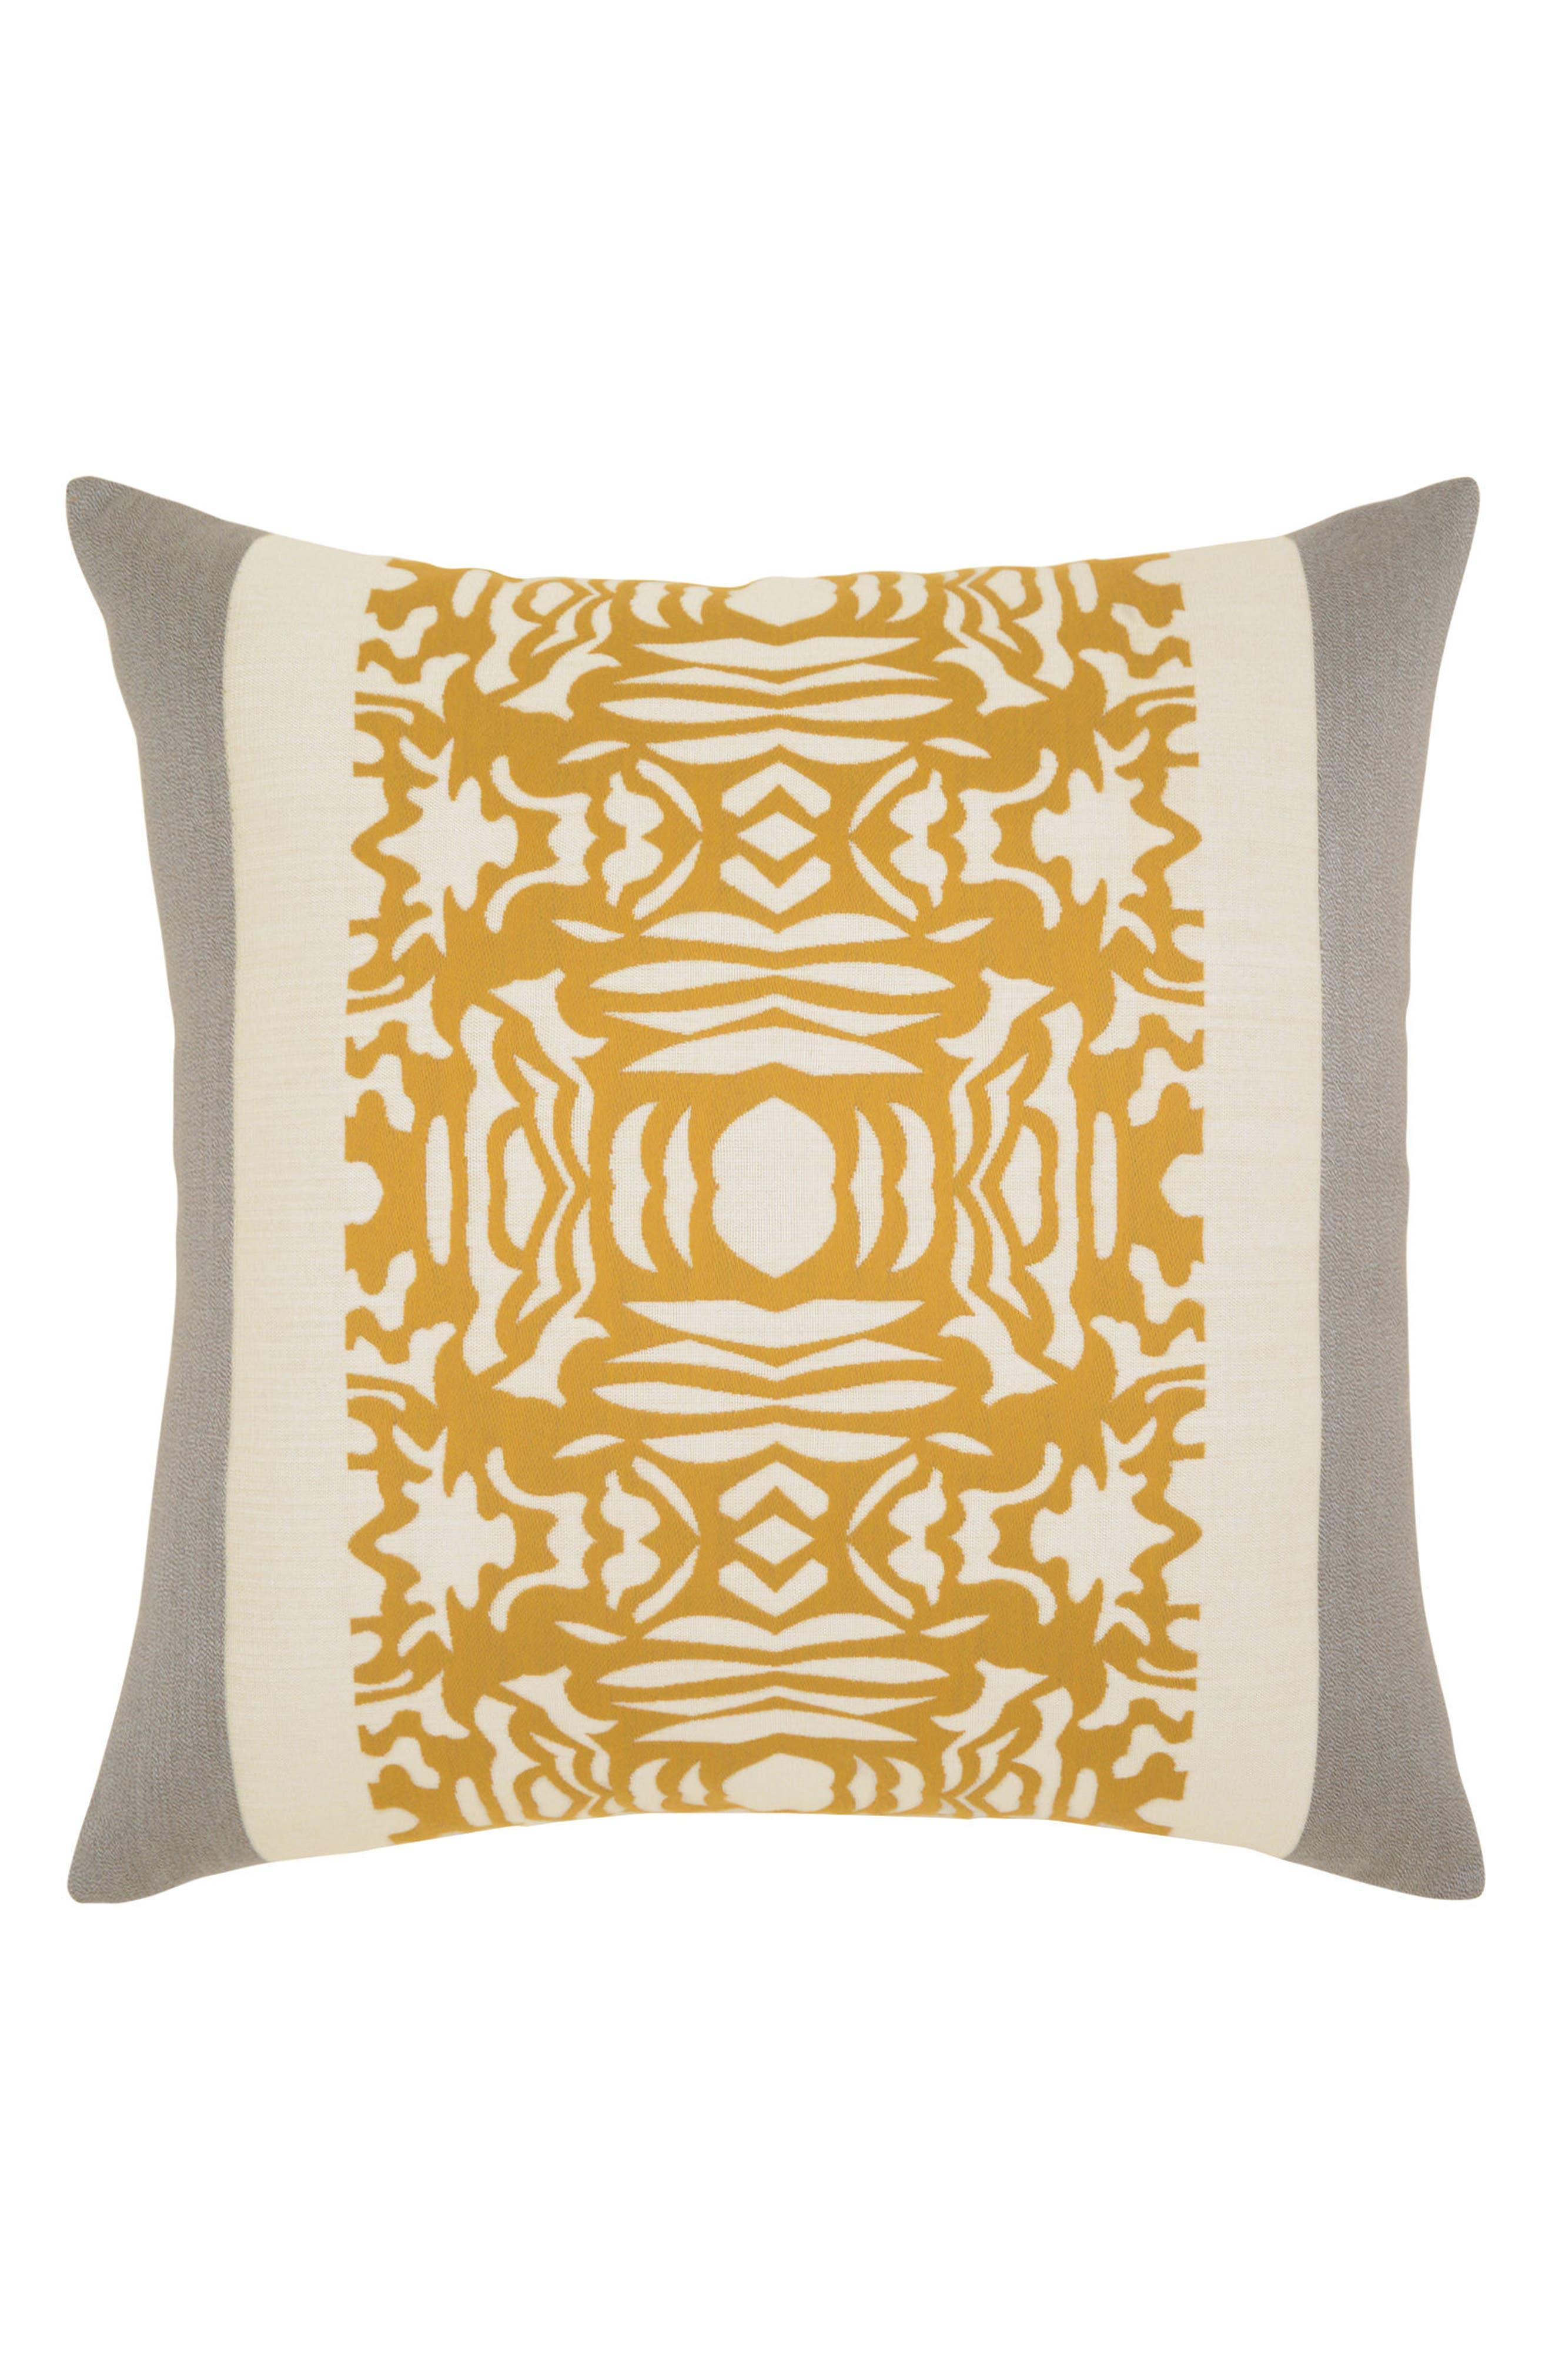 Metallic Block Indoor/Outdoor Accent Pillow,                             Main thumbnail 1, color,                             710